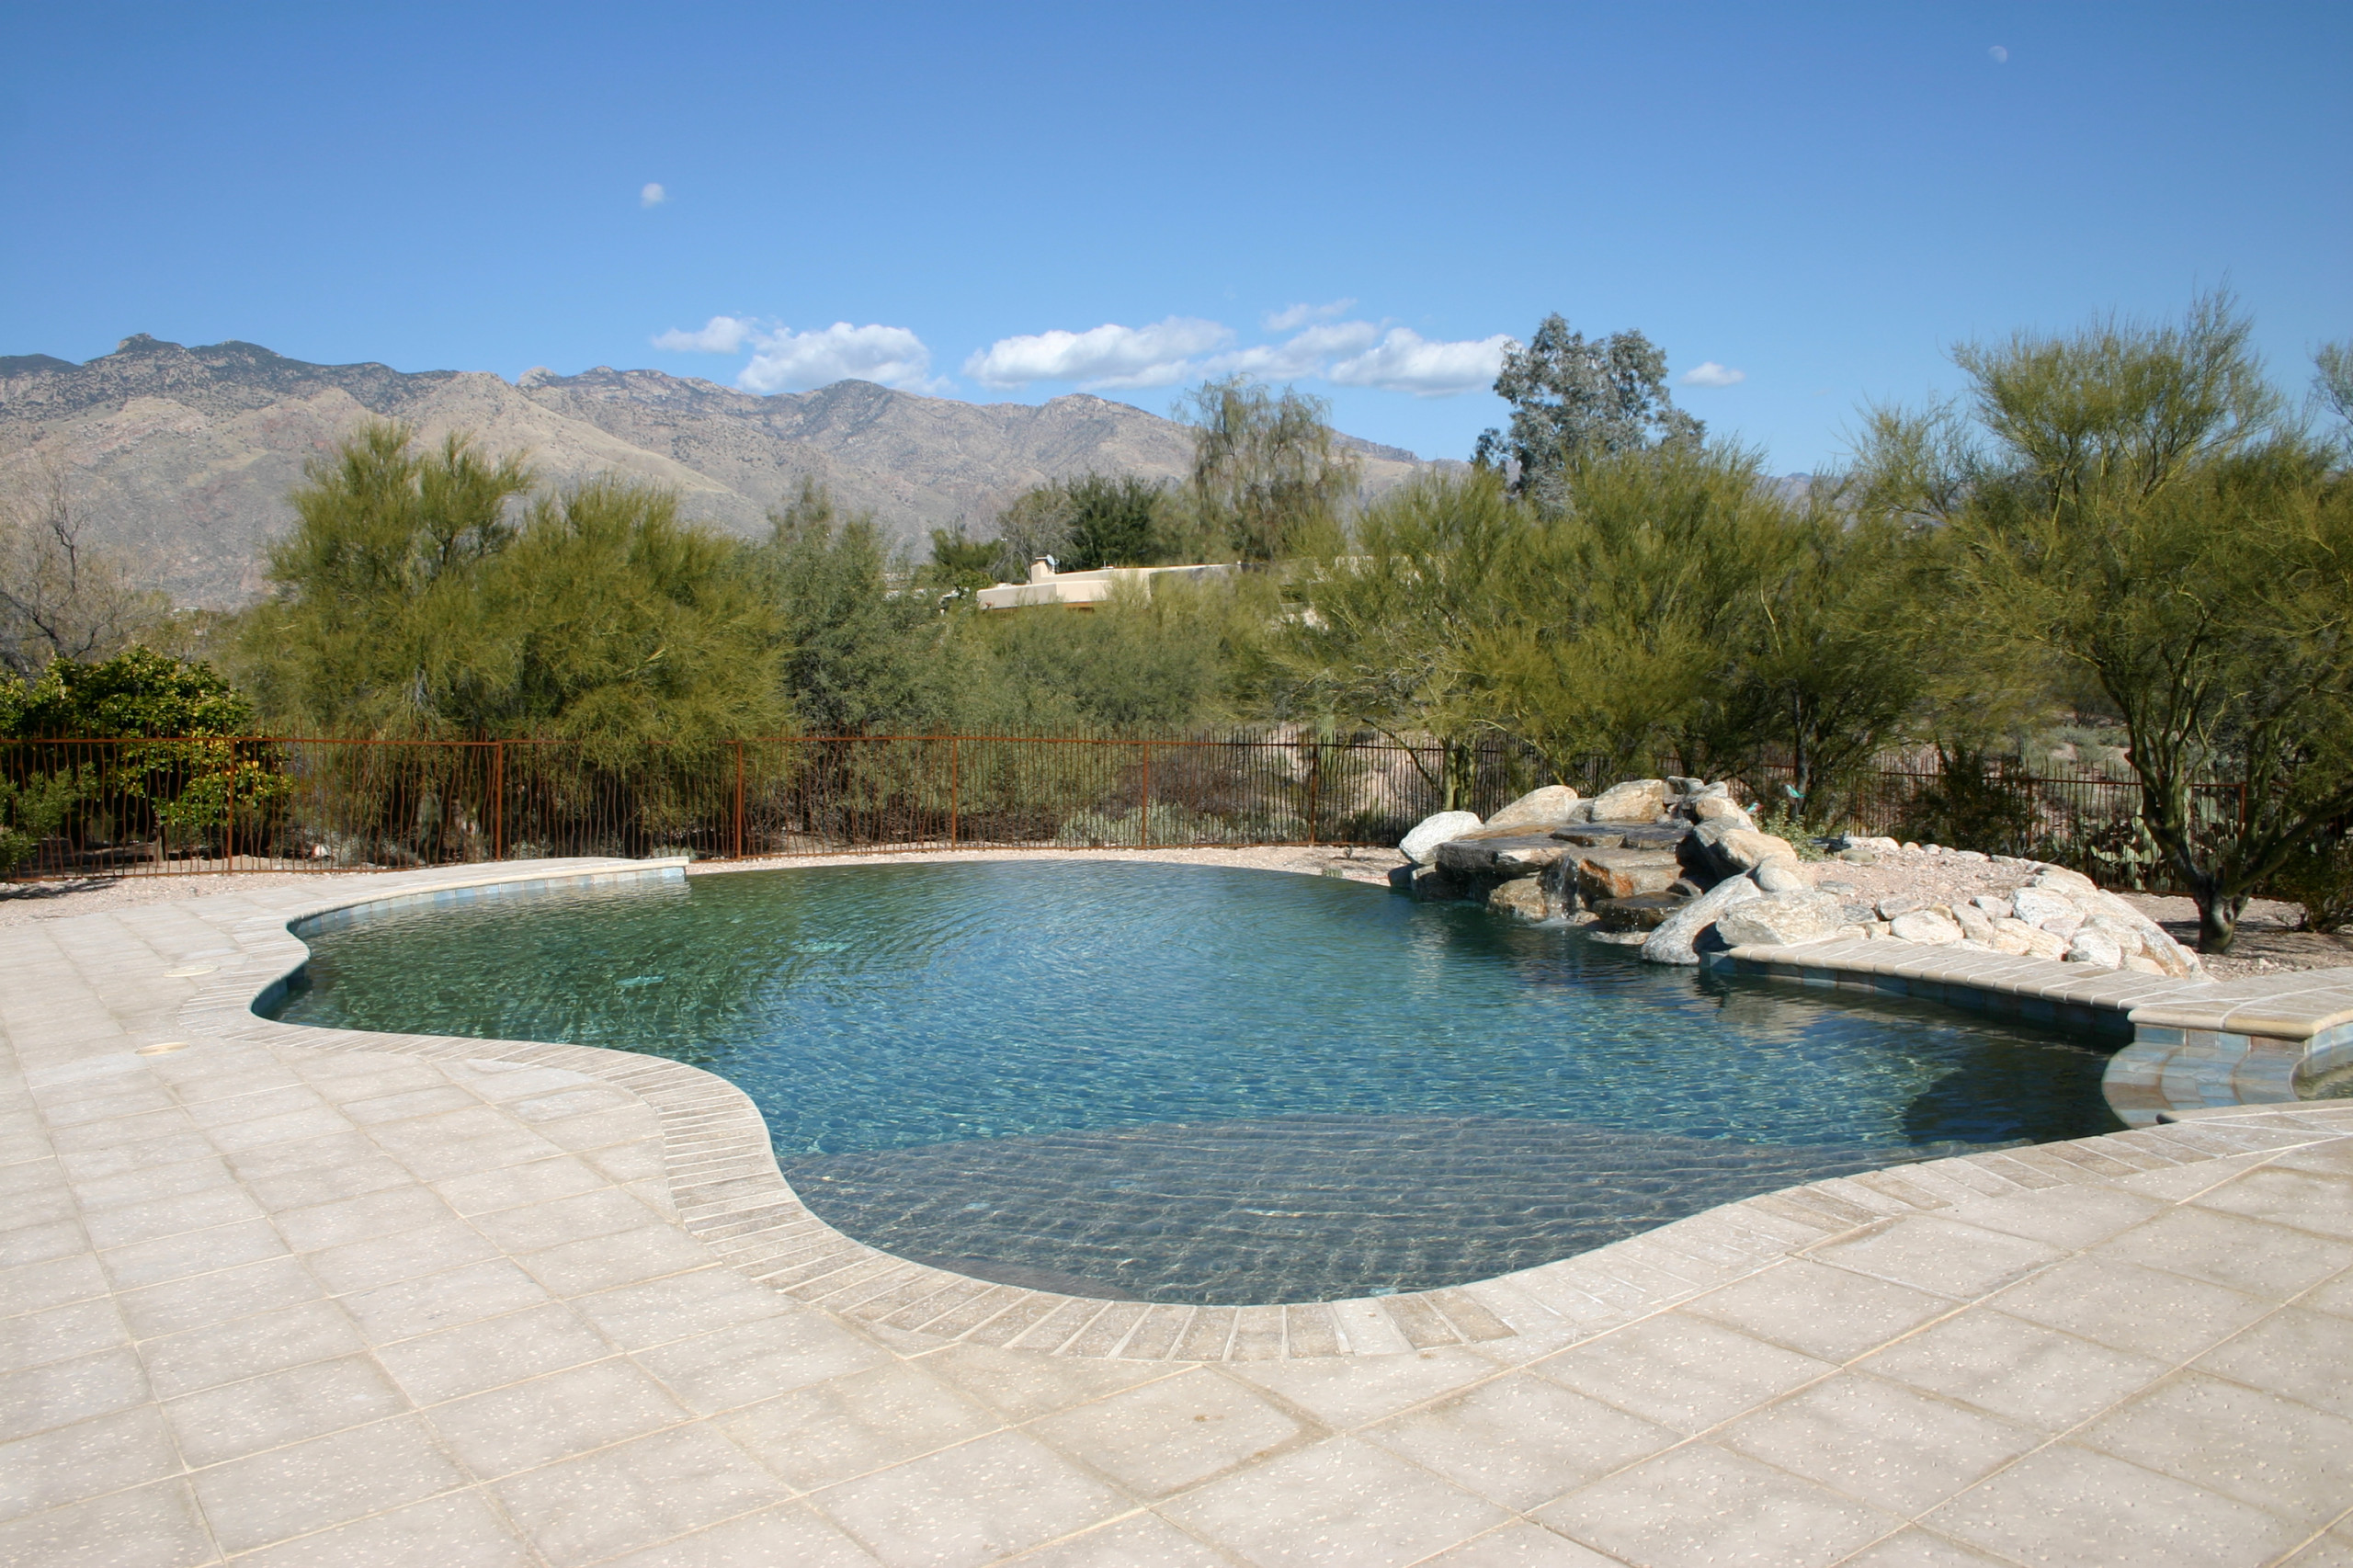 Calle Bujia Pool & Spa